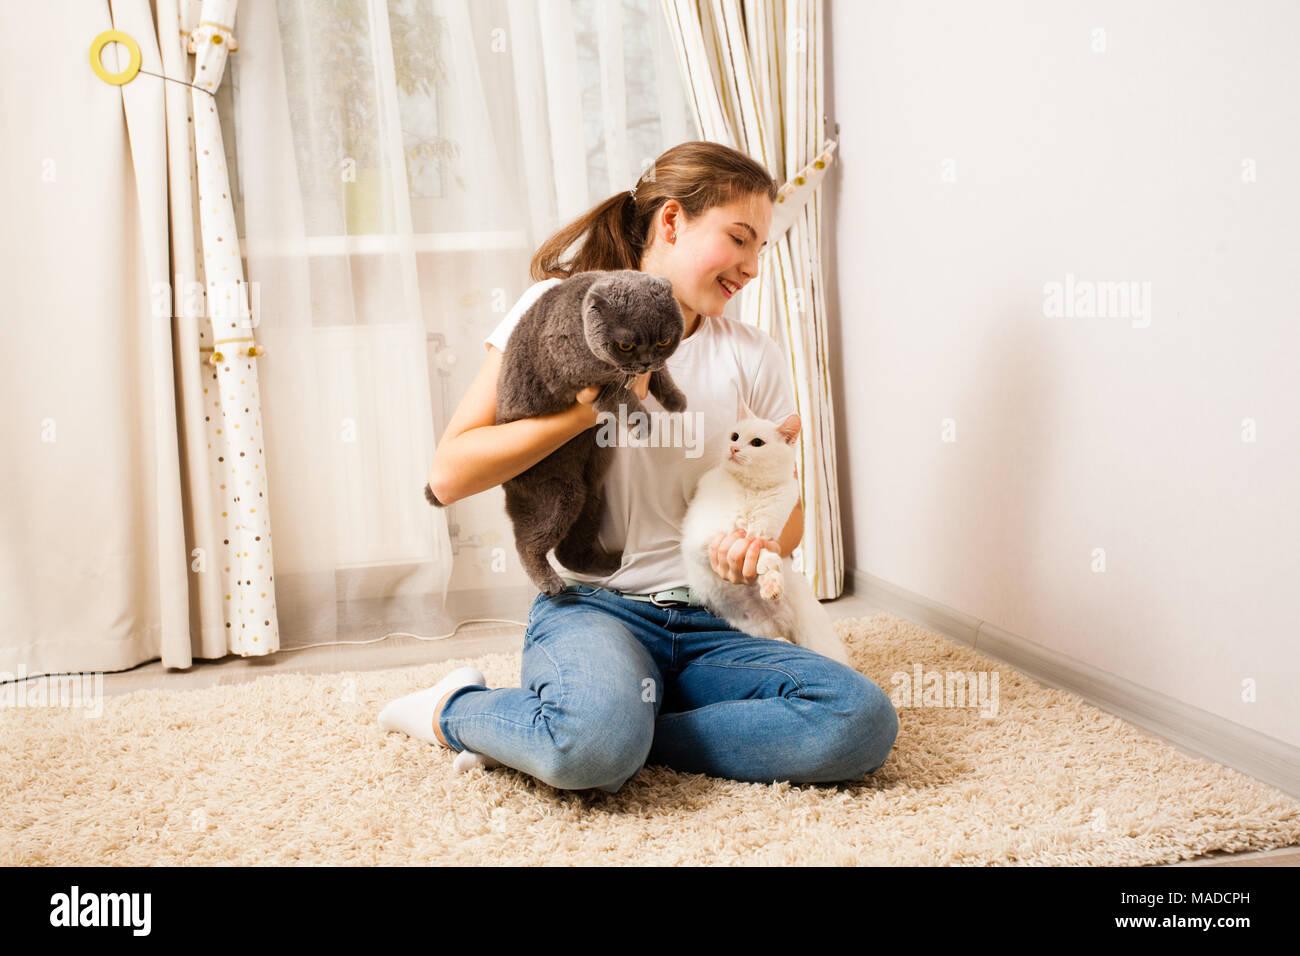 Jeune fille s'amuse avec ses chats Photo Stock